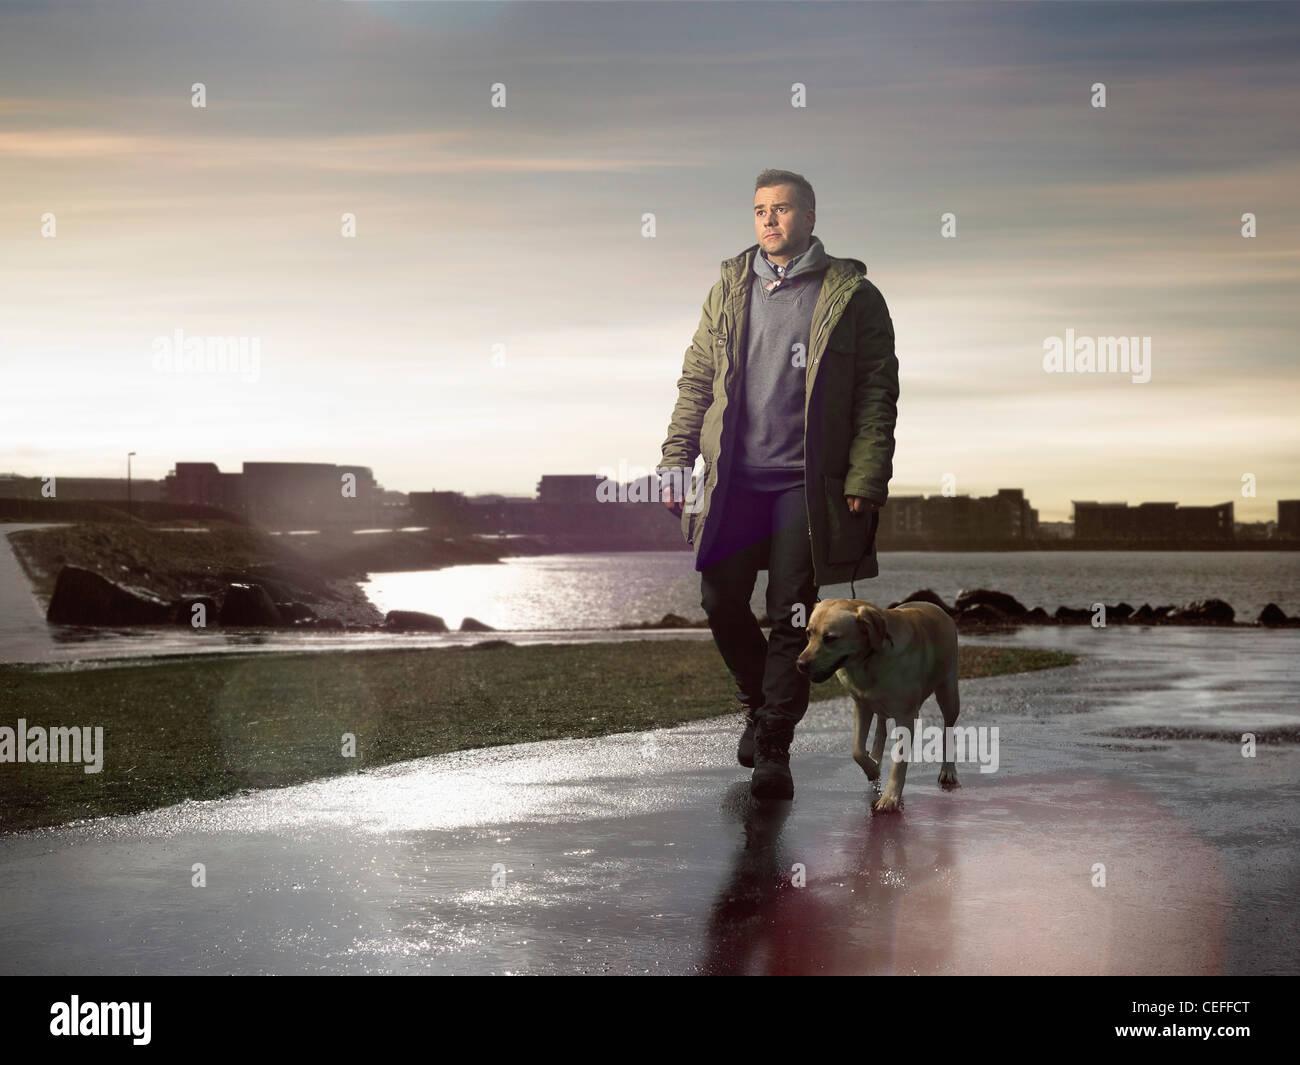 Mann zu Fuß Hund auf nasser Fahrbahn Stockbild